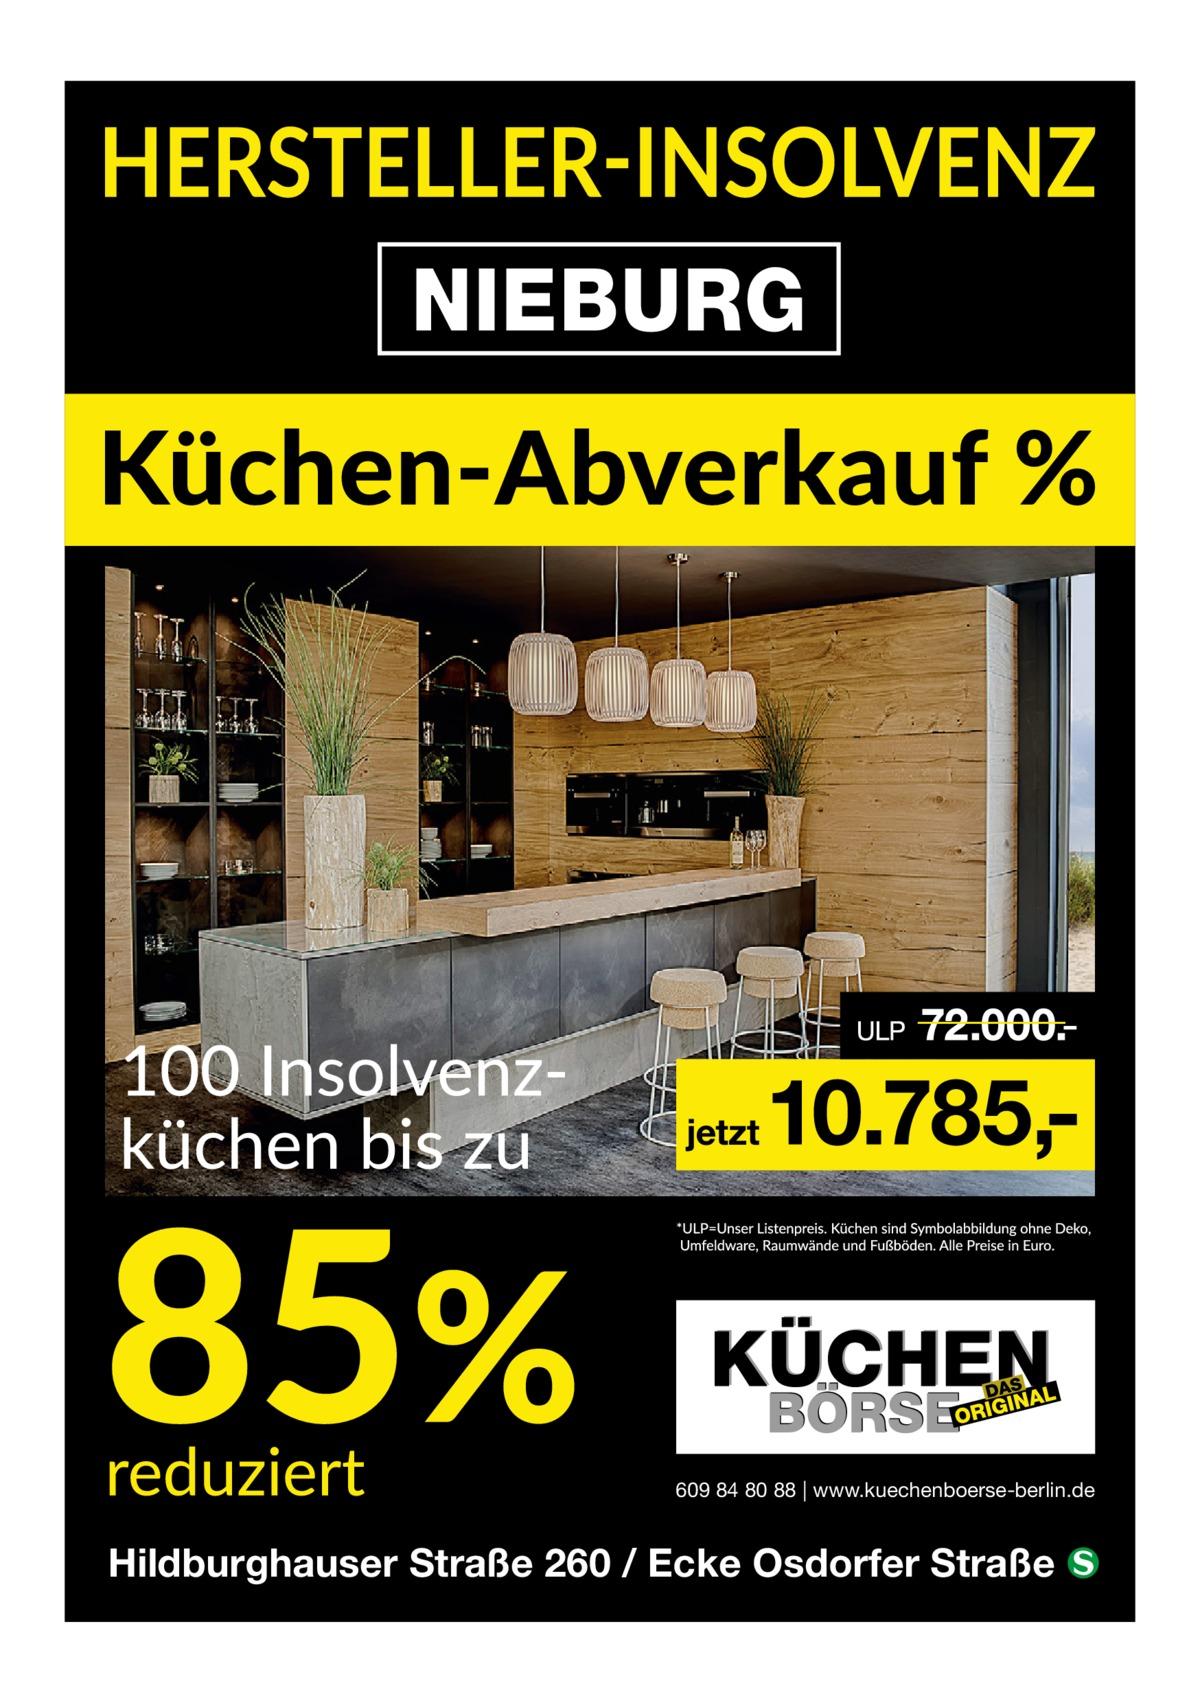 609 84 80 88 | www.kuechenboerse-berlin.de  Hildburghauser Straße 260 / Ecke Osdorfer Straße �